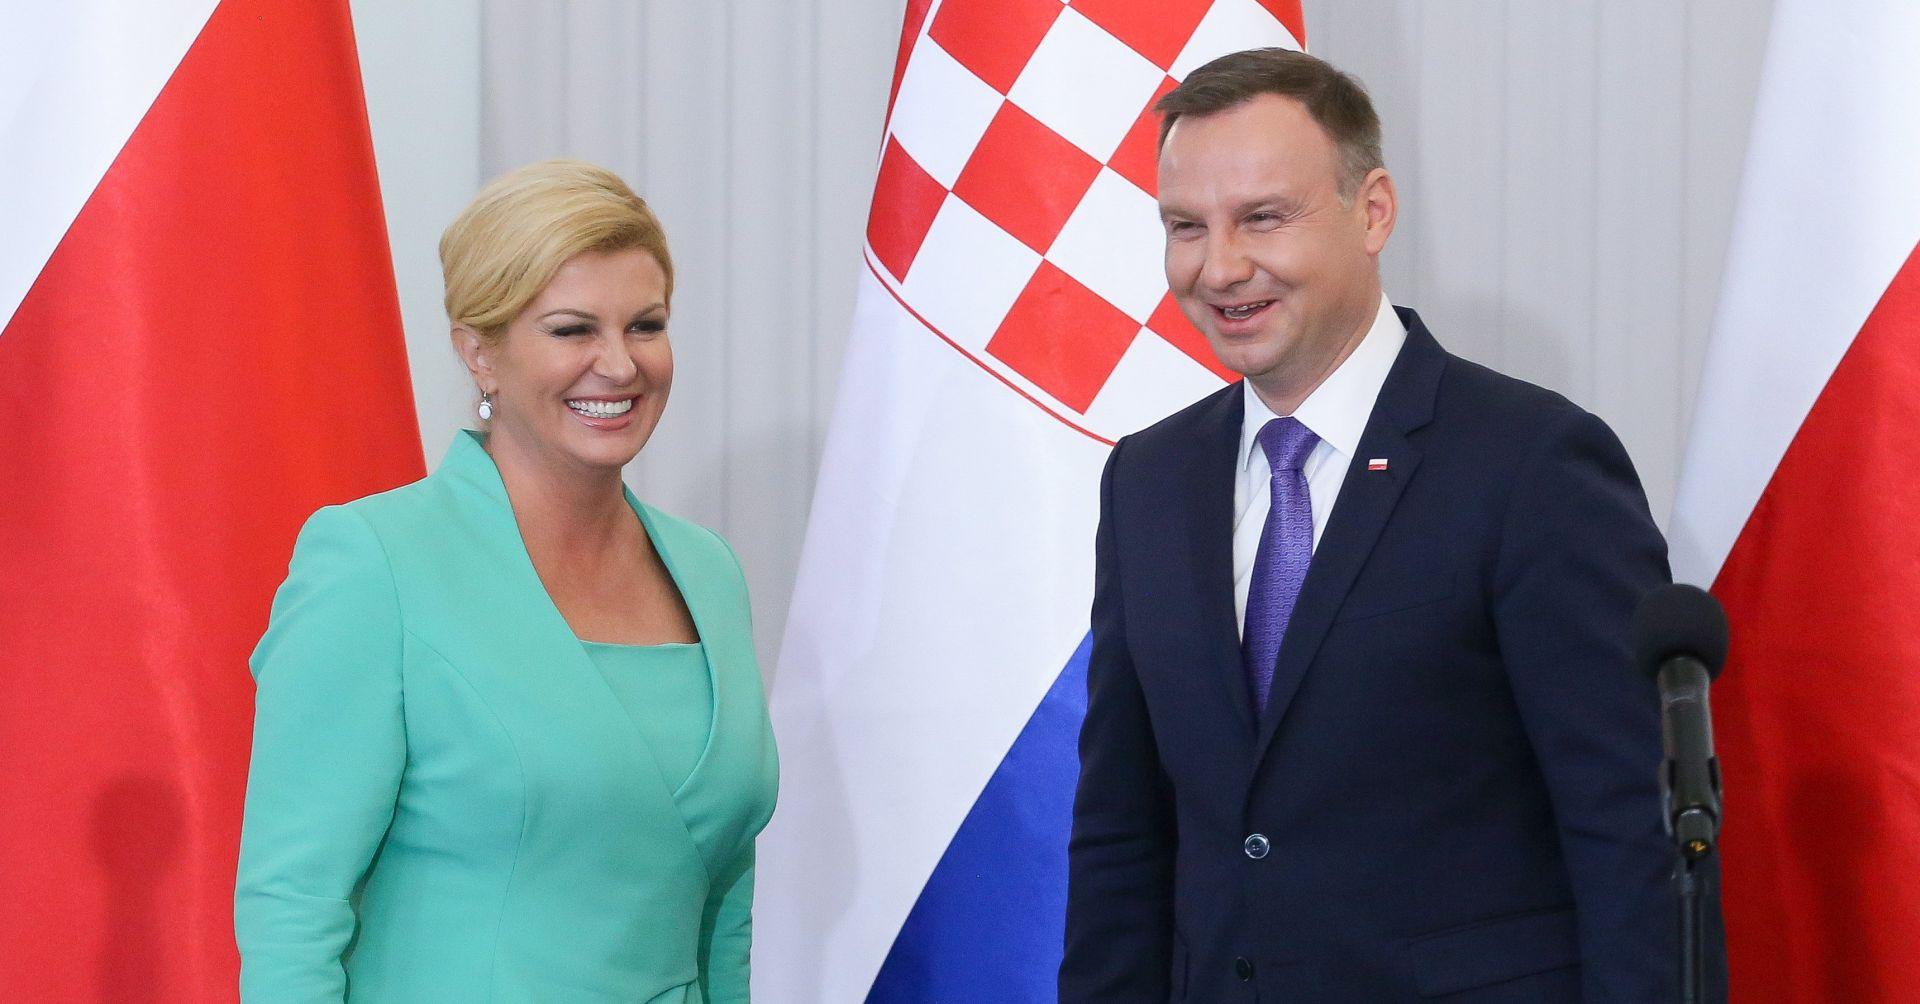 TURBULENTAN PRAZNIK NEOVISNOSTI Poljski predsjednik osudio nacionalističke slogane